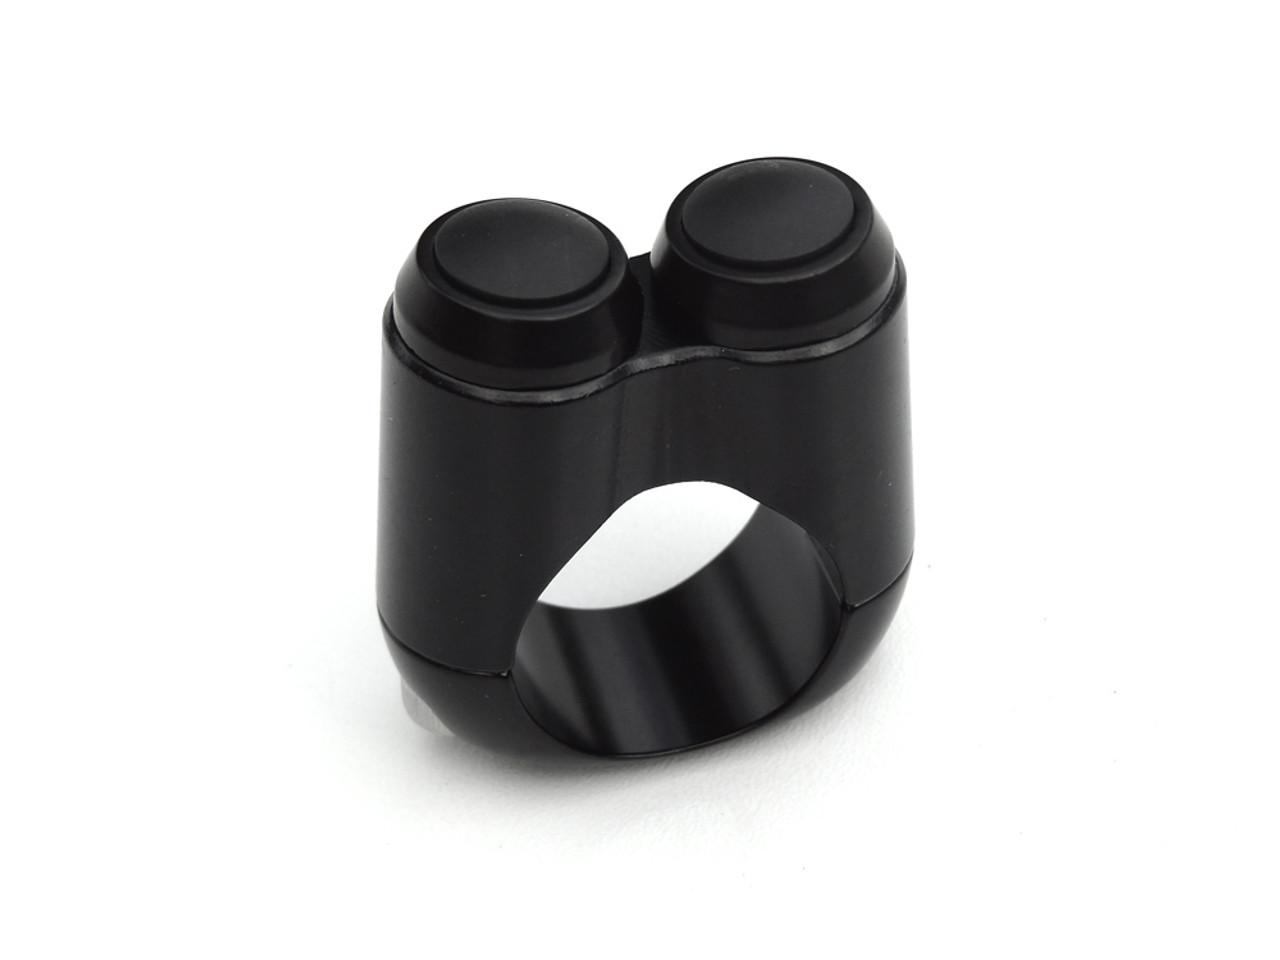 "Dual Button Microswitch 7/8"" Metric Handlebar - Black"